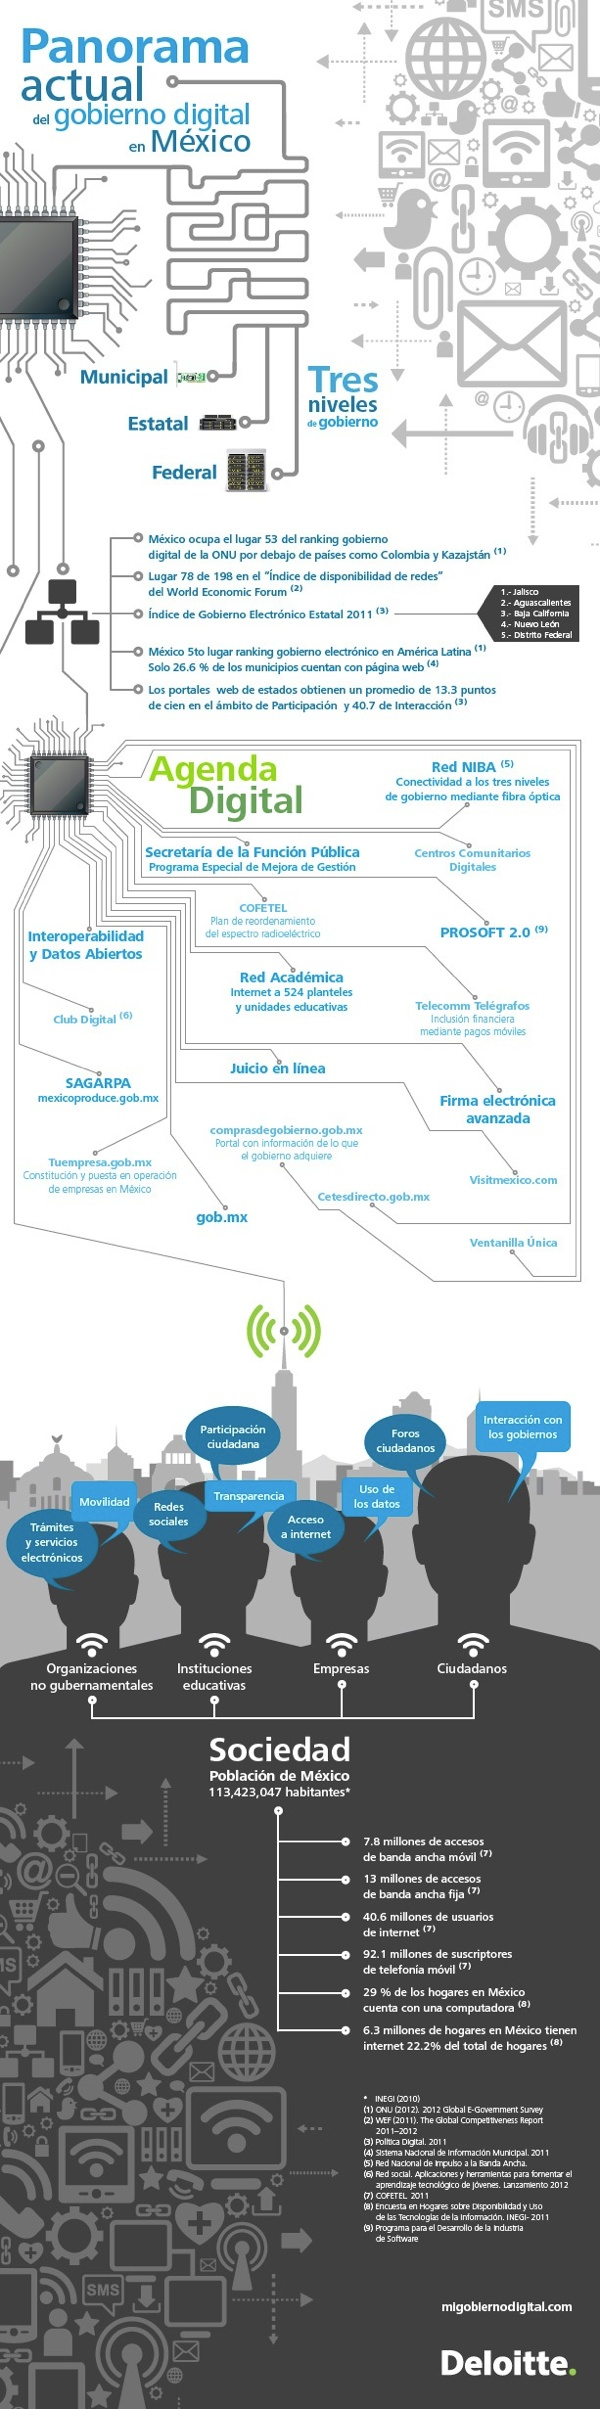 Gobierno digital en México #Infografia